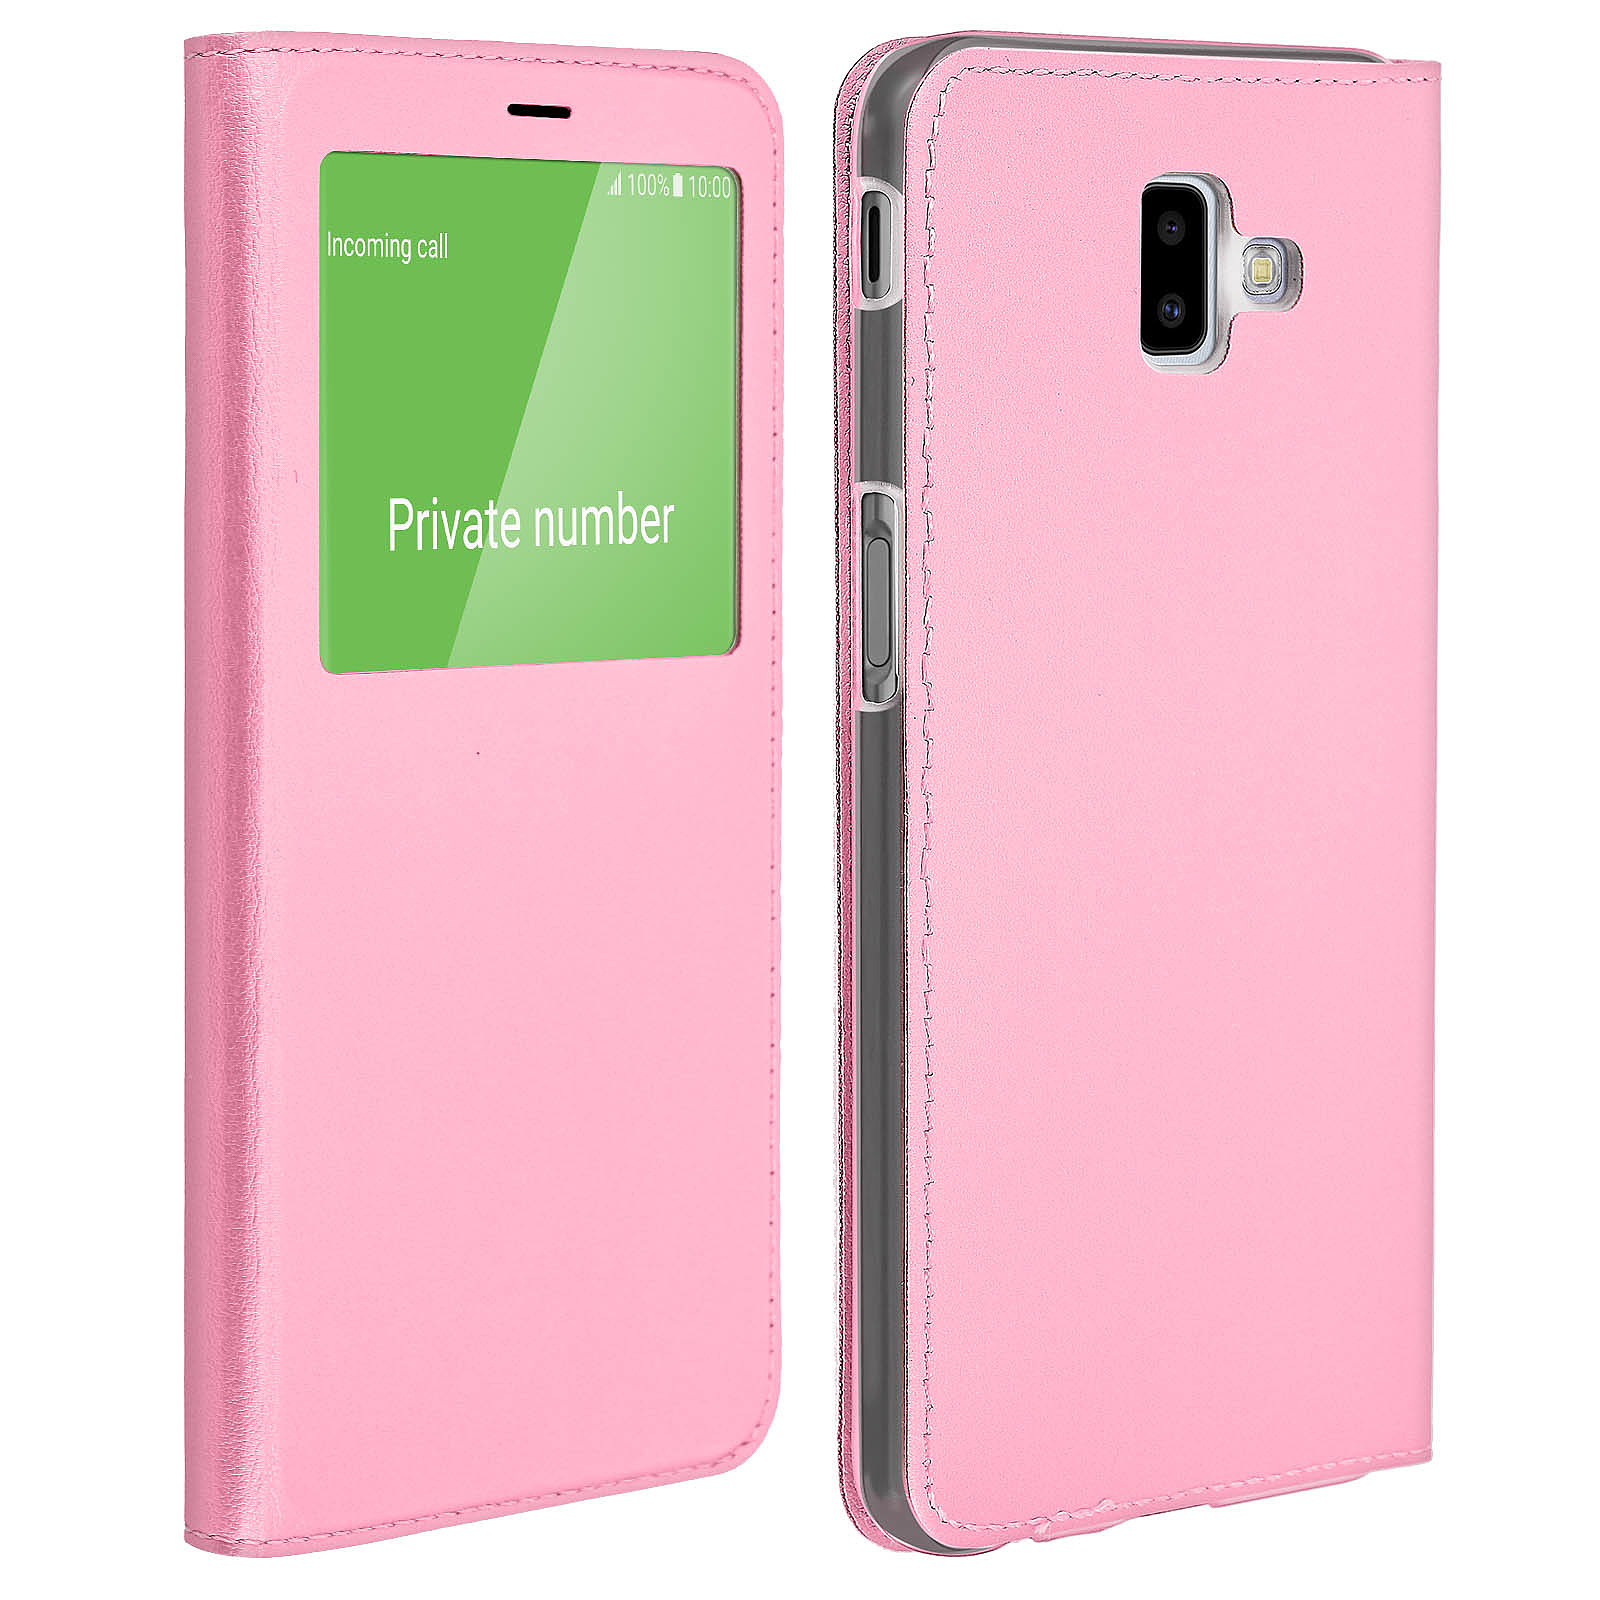 Avizar Etui folio Rose pour Samsung Galaxy J6 Plus